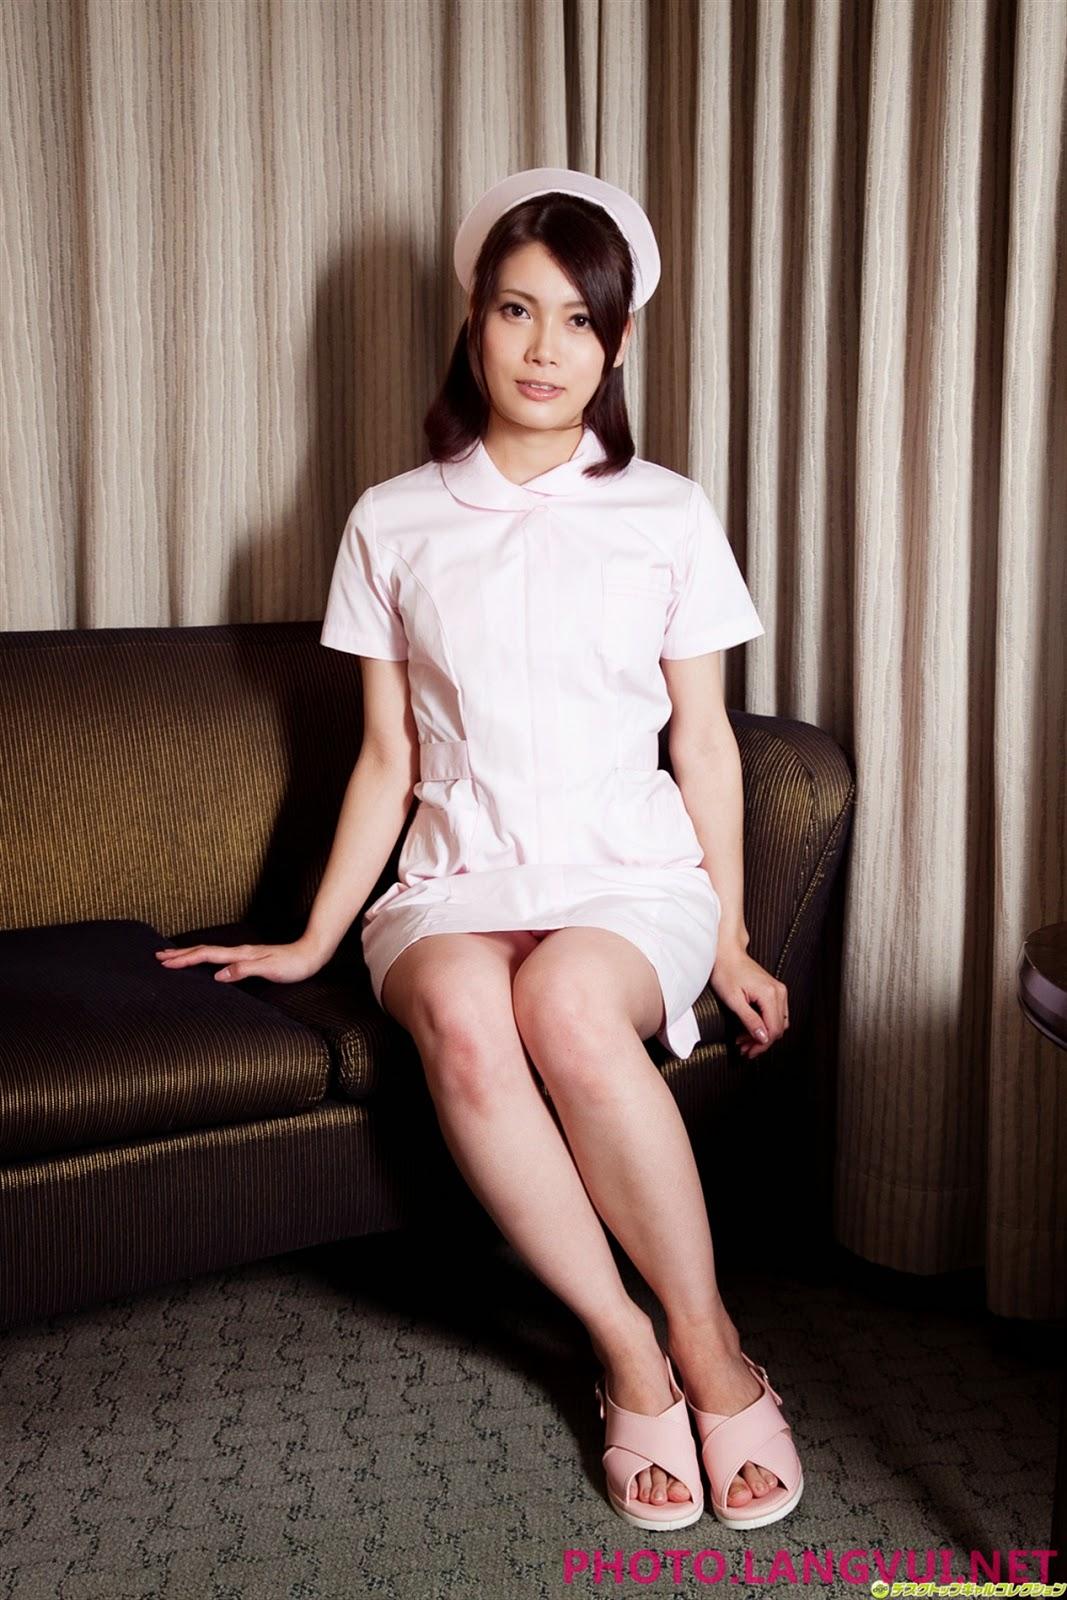 DGC No-1106 Akemi Horiuchi - Page 9 of 11 - Ảnh Girl Xinh